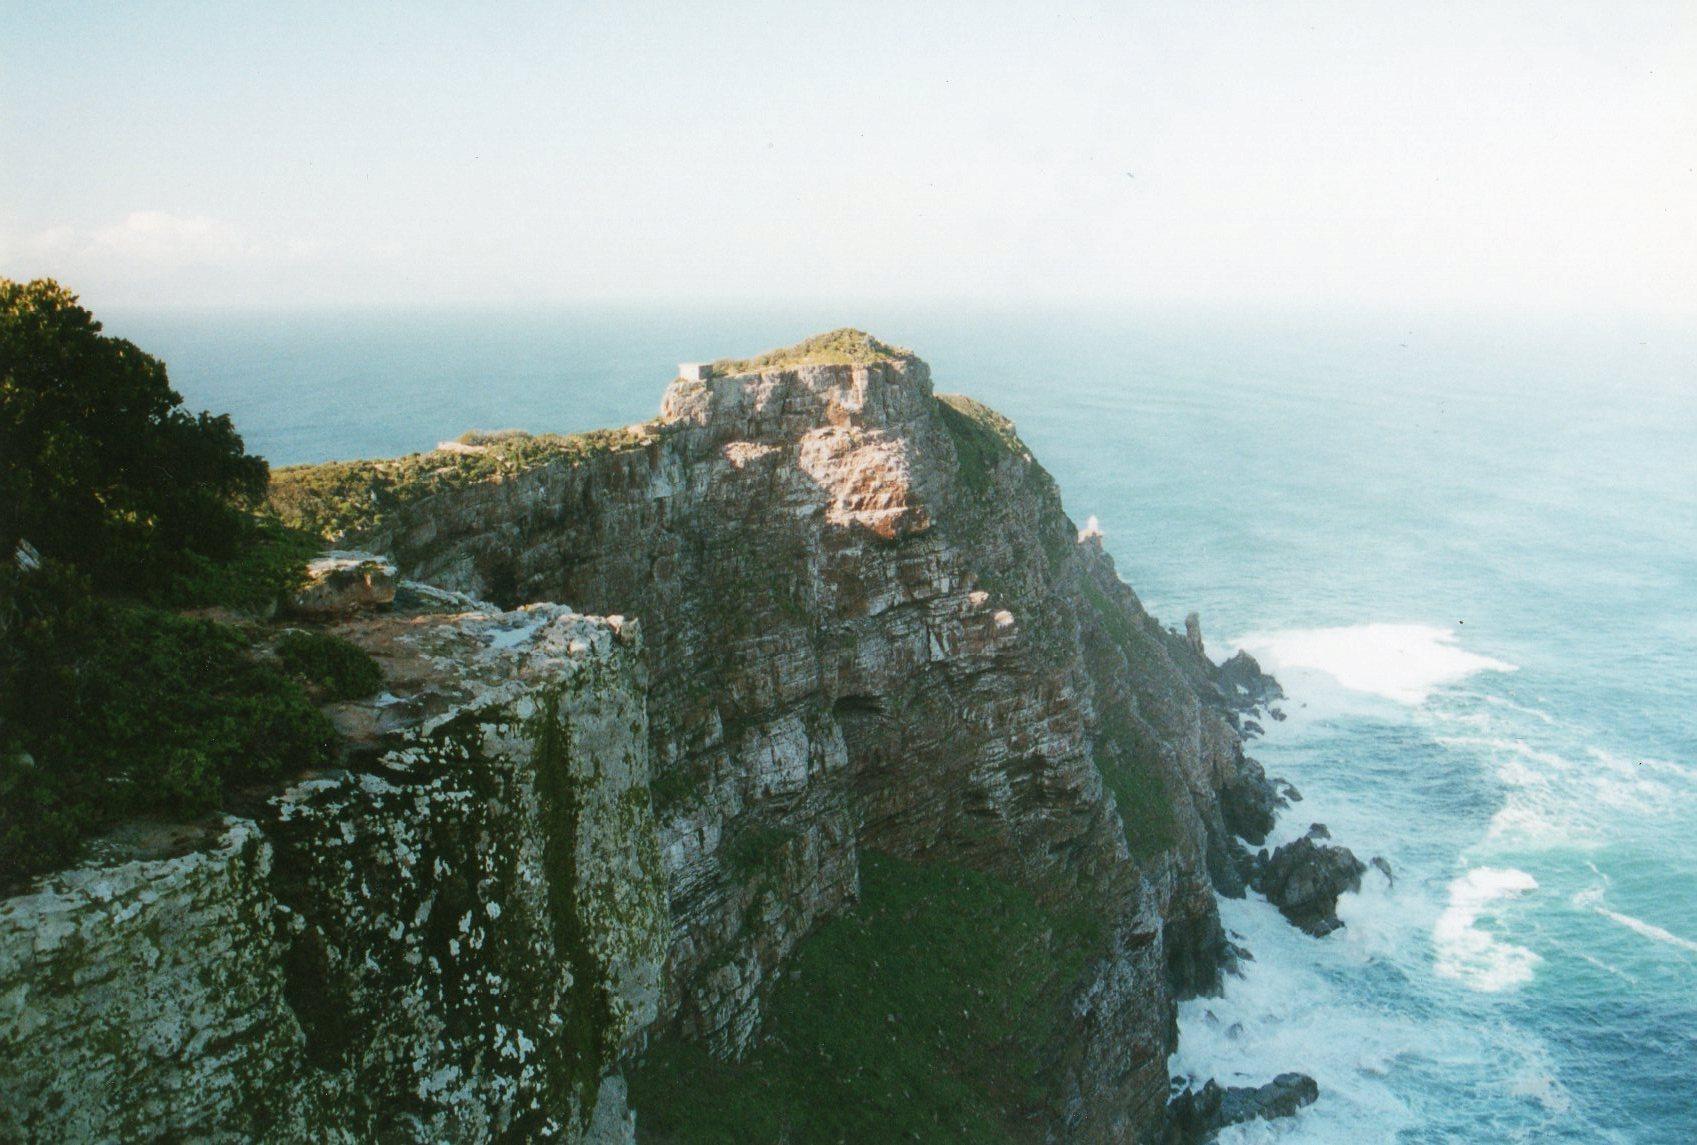 South Africa Western Cape Cape Area, Cape of Good Hope, Cape Point , Walkopedia